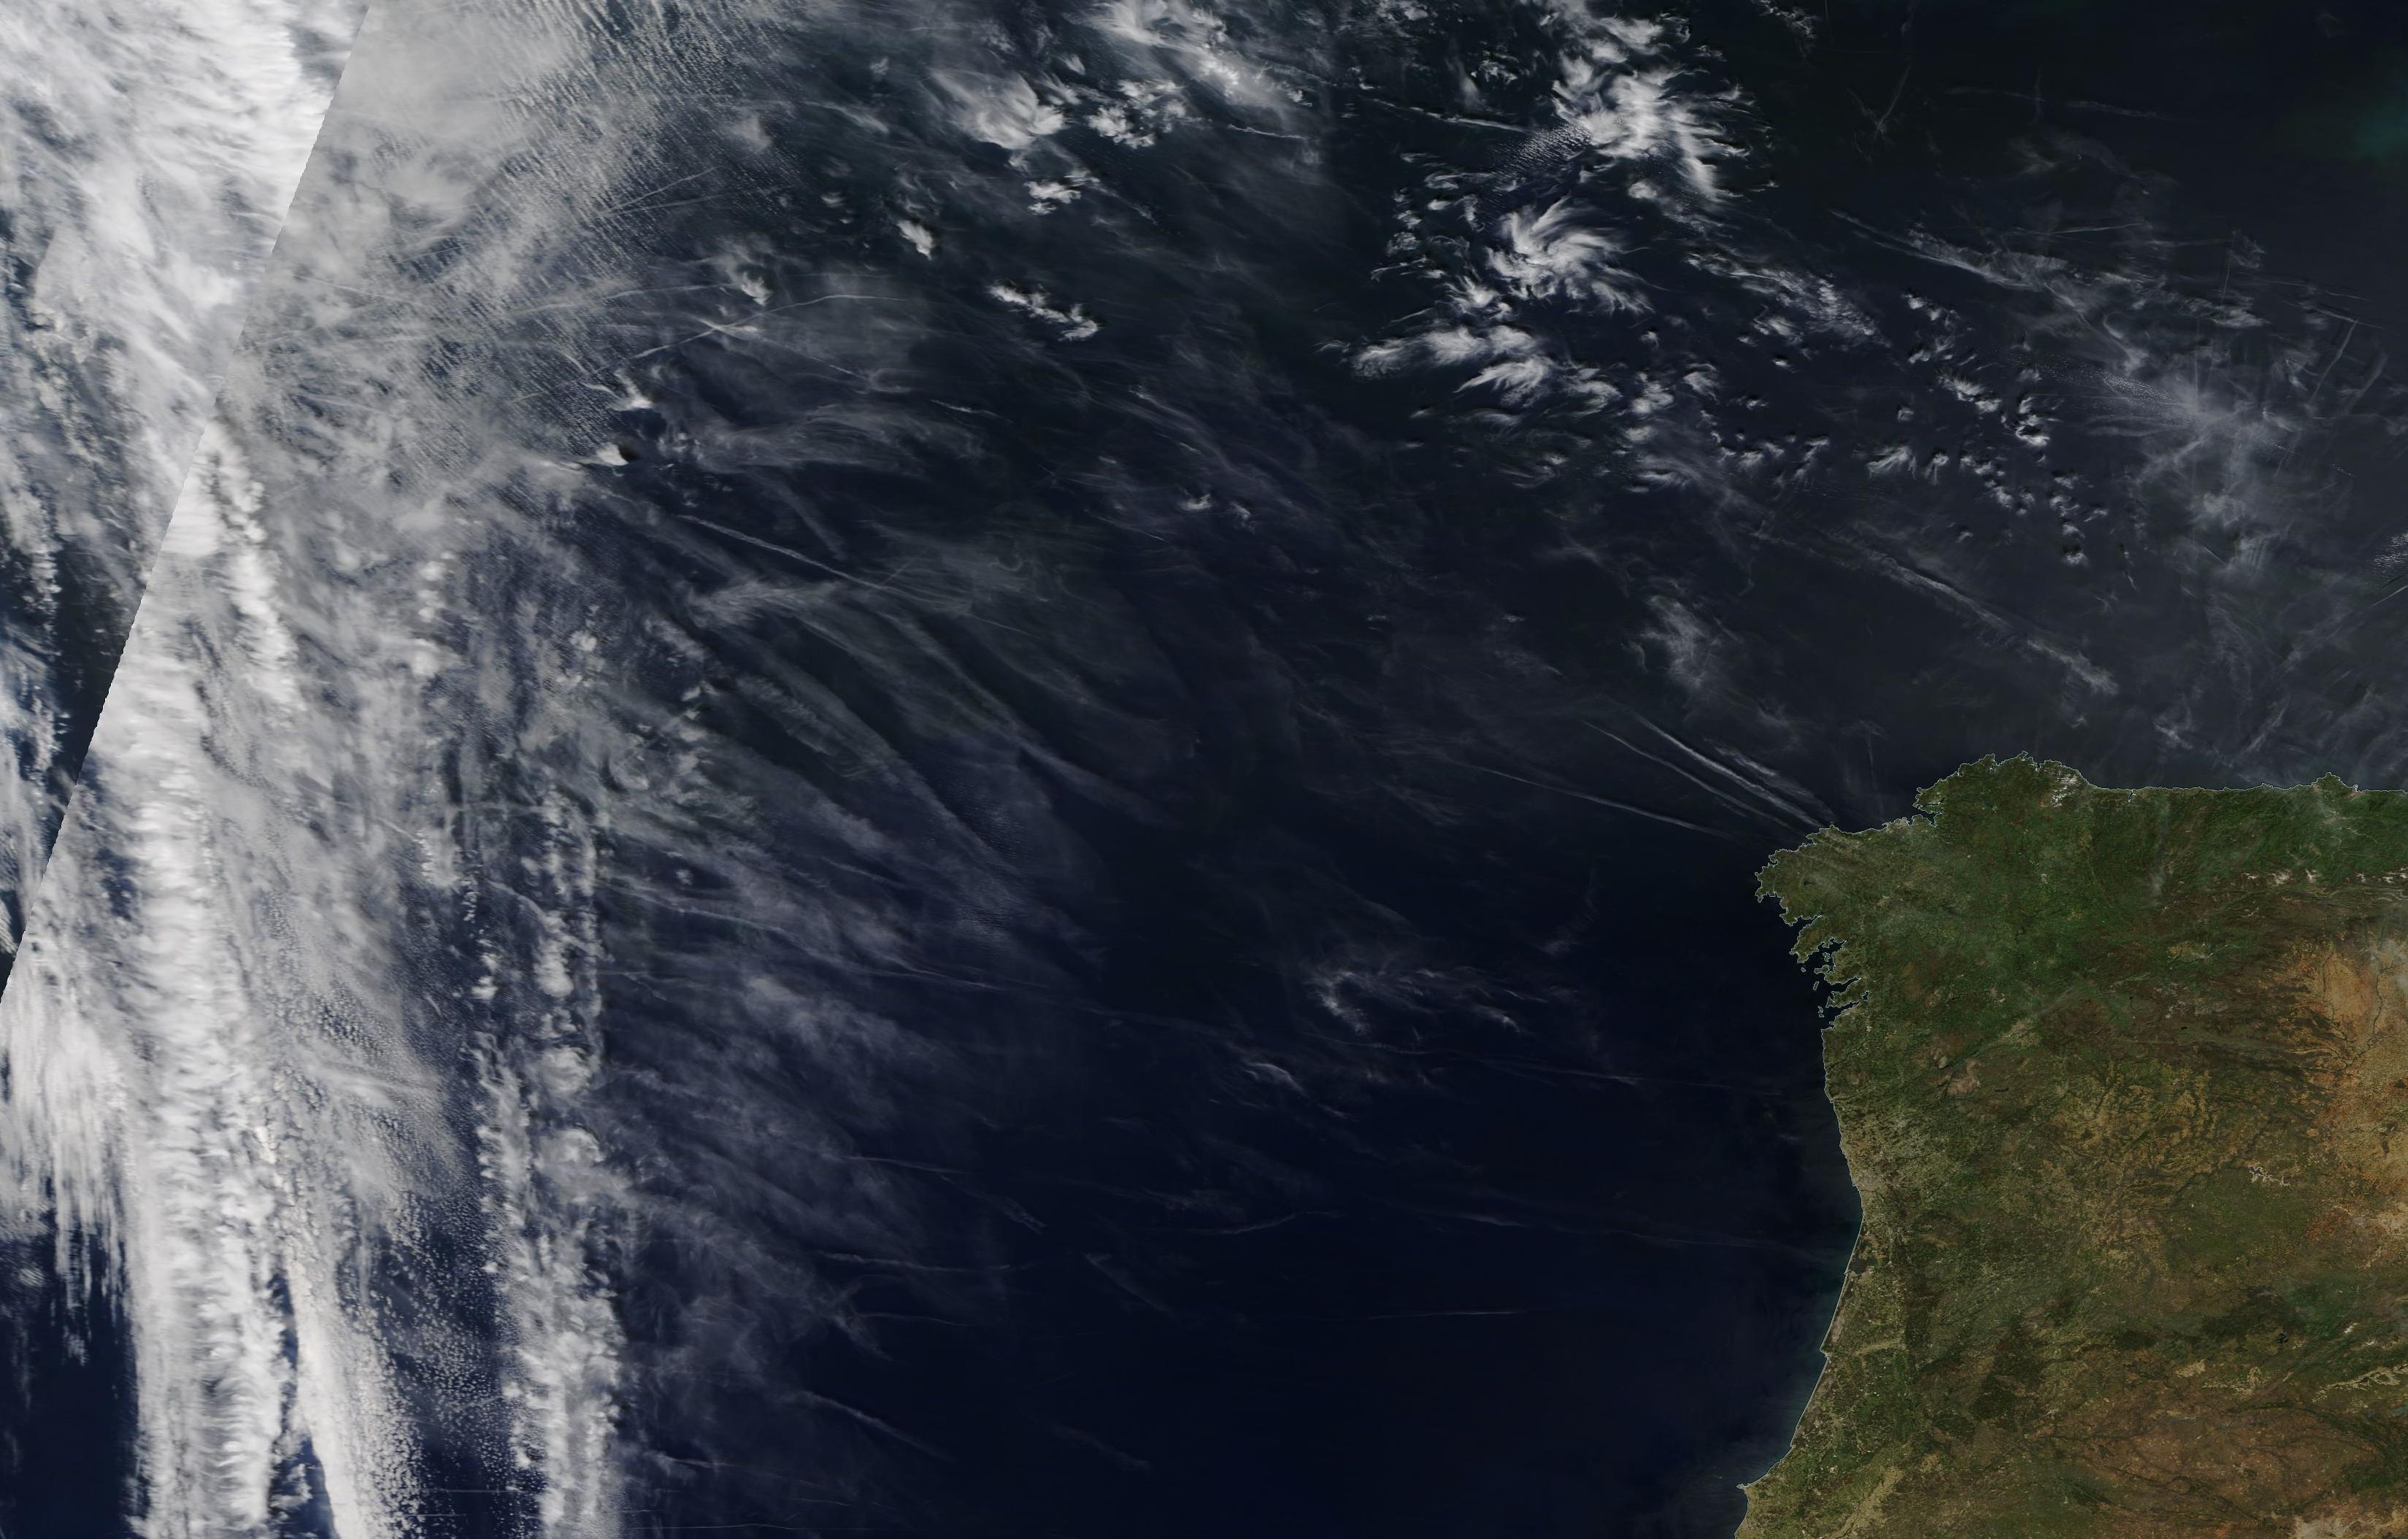 chemtrail geoengineering shipping area Trafalgar, Atlantic west of Spain and Portugal Sunday 12 May 2019 ...https://go.nasa.gov/2E75p39